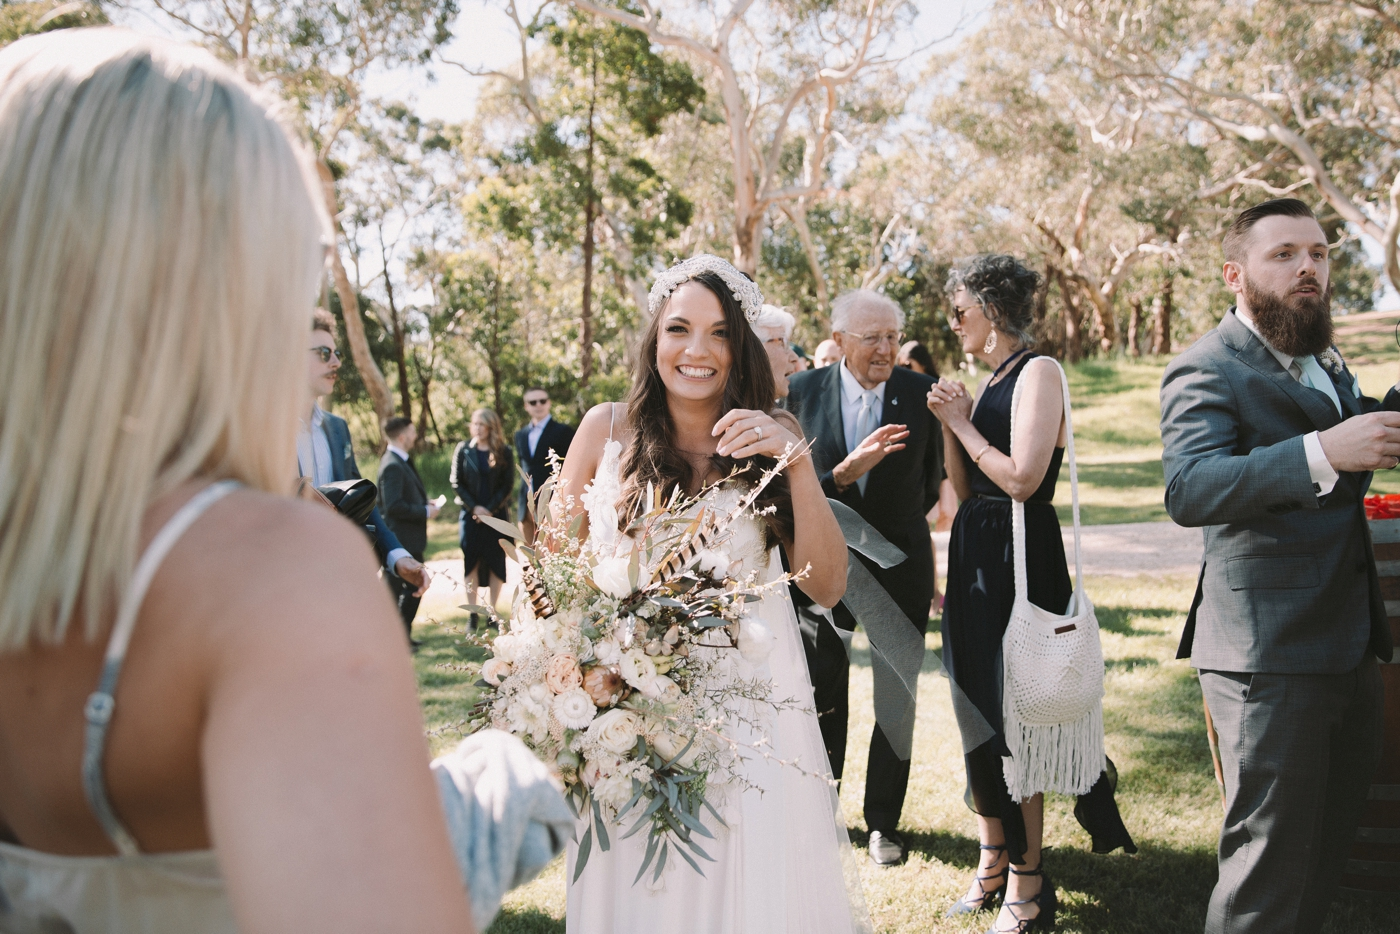 Maddy & Wes - K1 by Geoff Hardy Wedding - Adelaide Wedding Photographer - Natural wedding photography in Adelaide - Katherine Schultz_0036.jpg